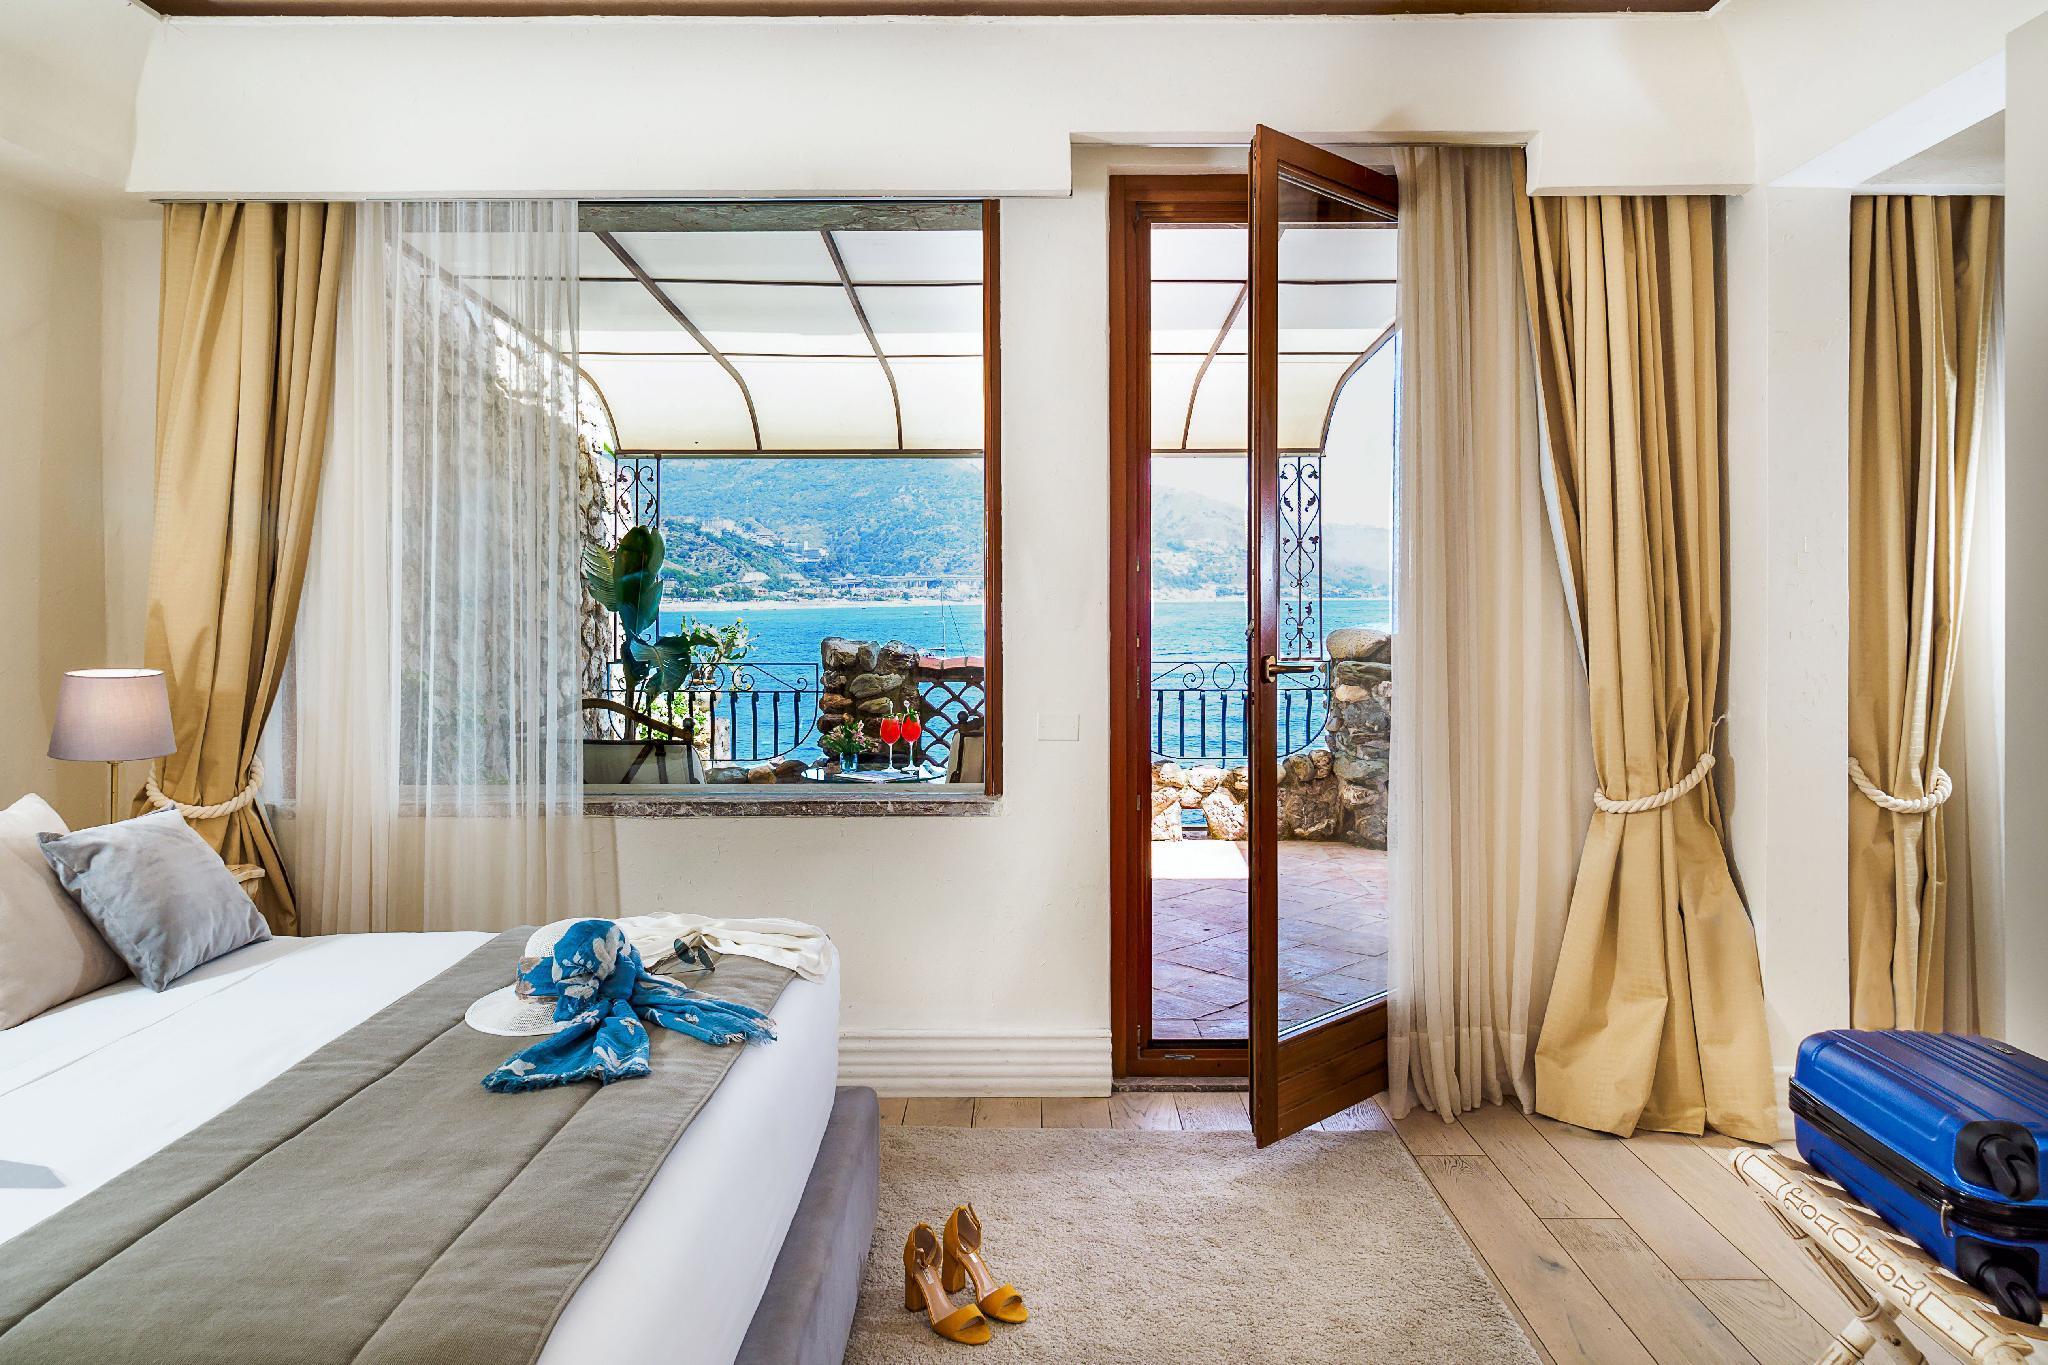 Voi Grand Hotel Atlantis Bay Pet Friendly Taormina Italien Preise 2020 Agoda